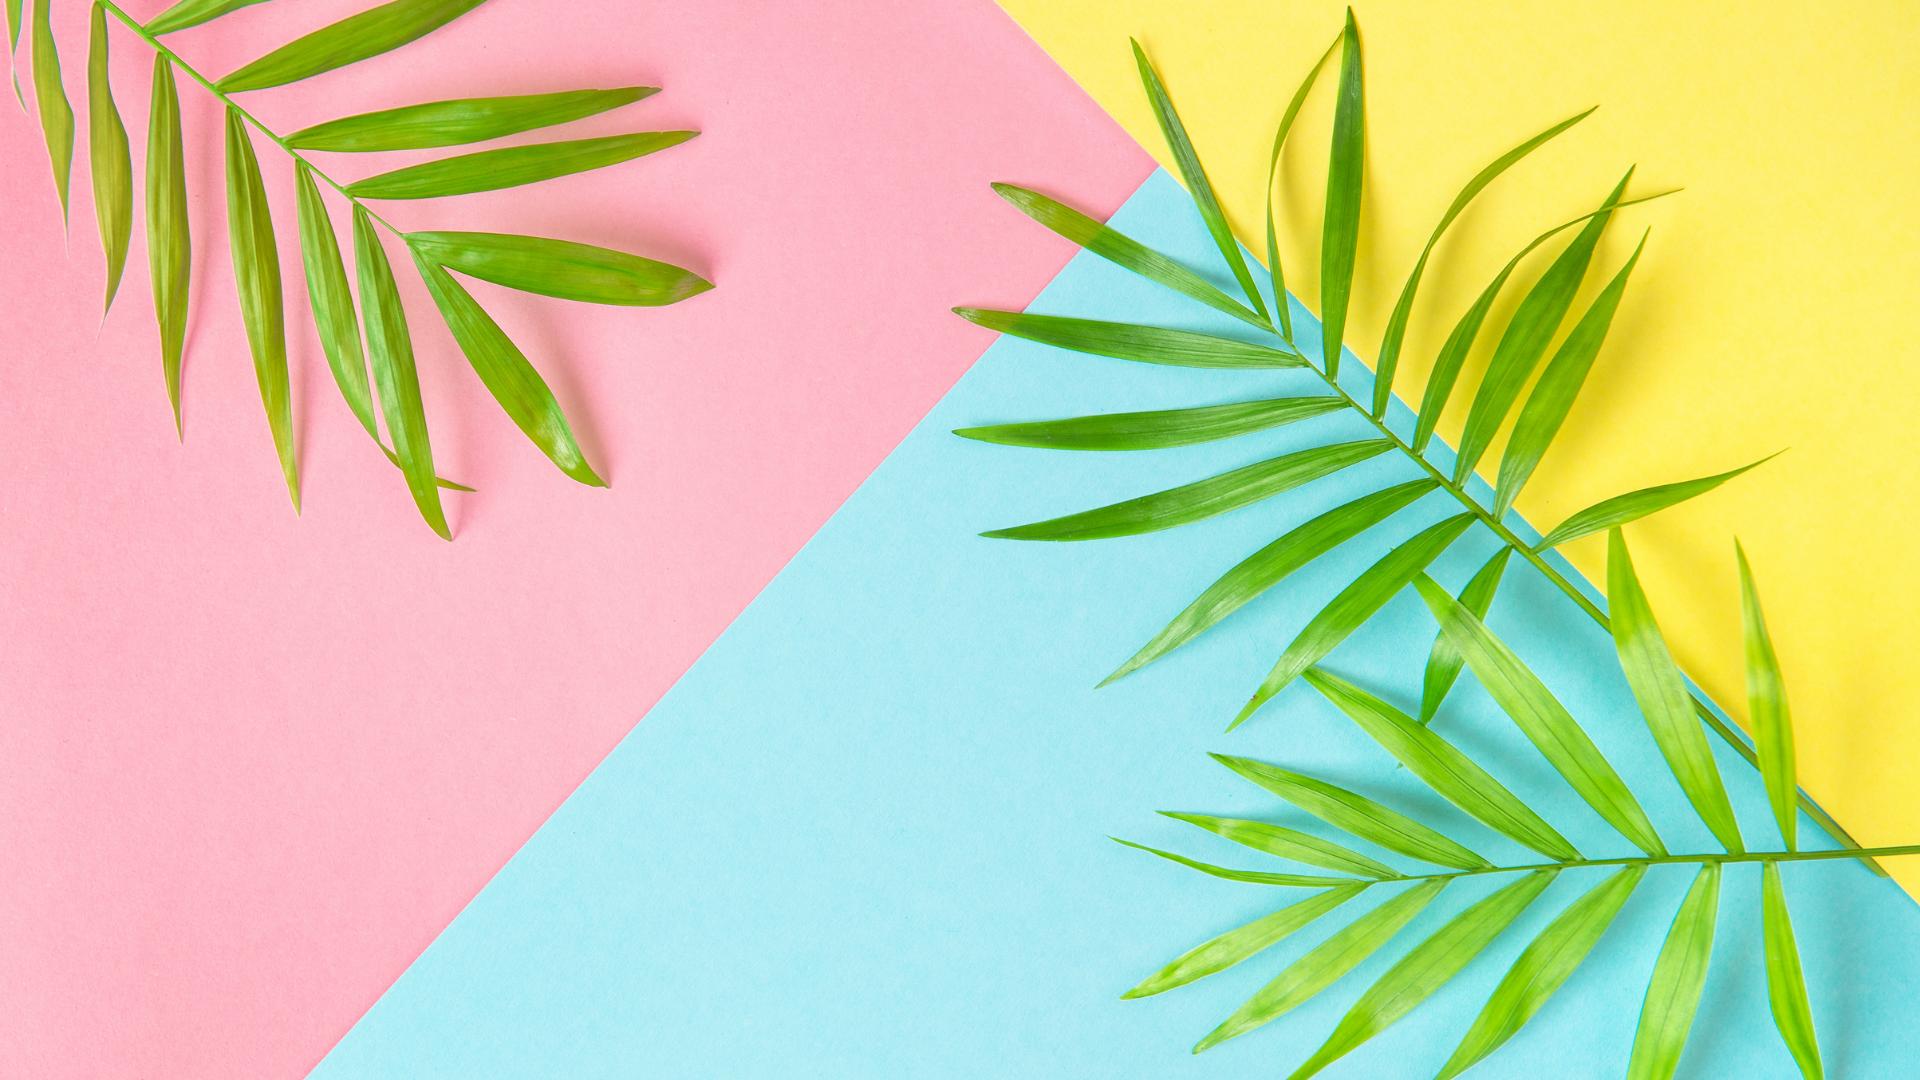 FREE Summer Digital Wallpapers